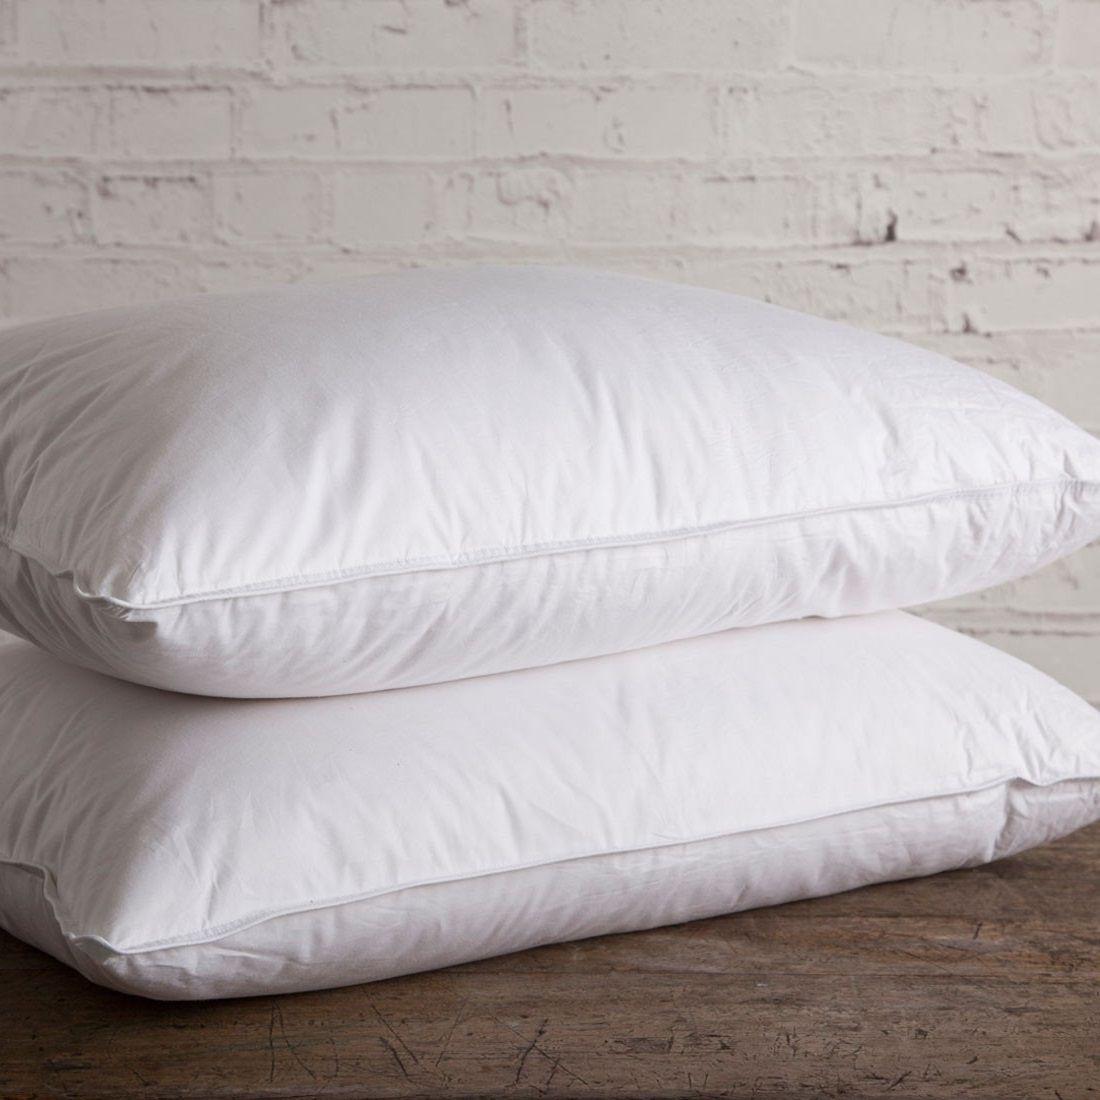 100 Siberian Goose Down Pillow Goose Down Pillows Down Pillows Pillows